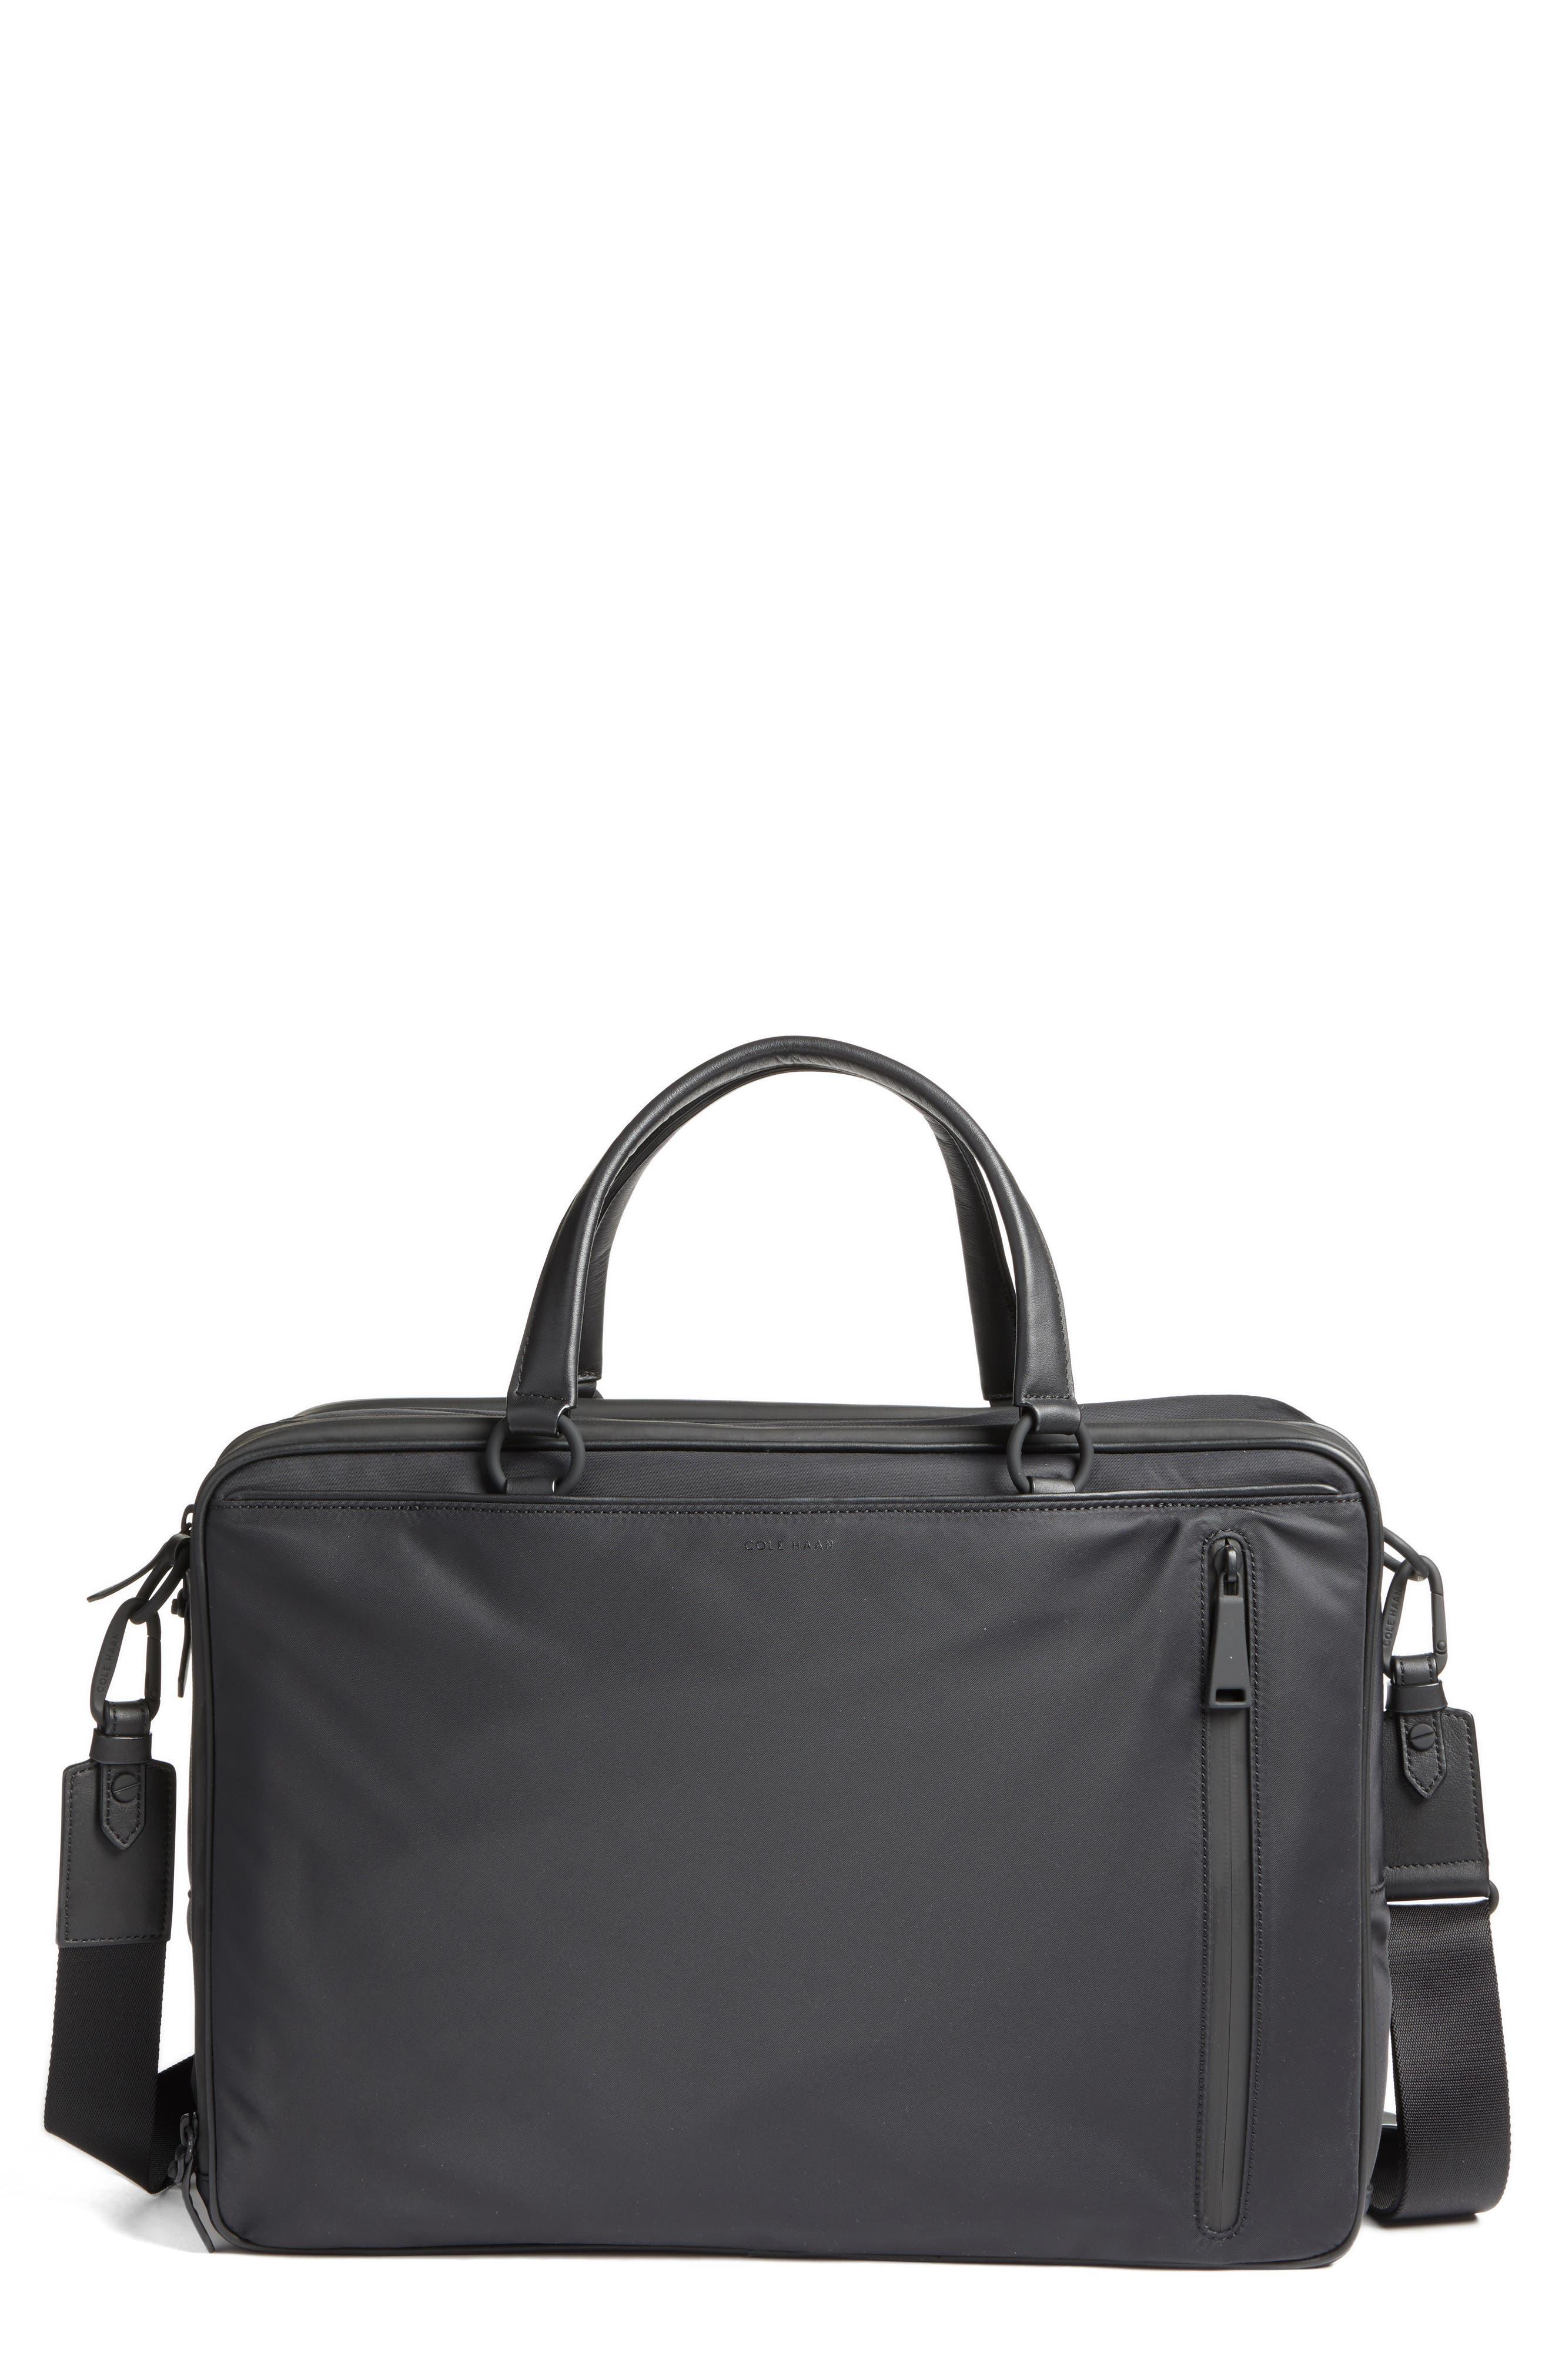 Cole Haan Grand OS Attache Briefcase